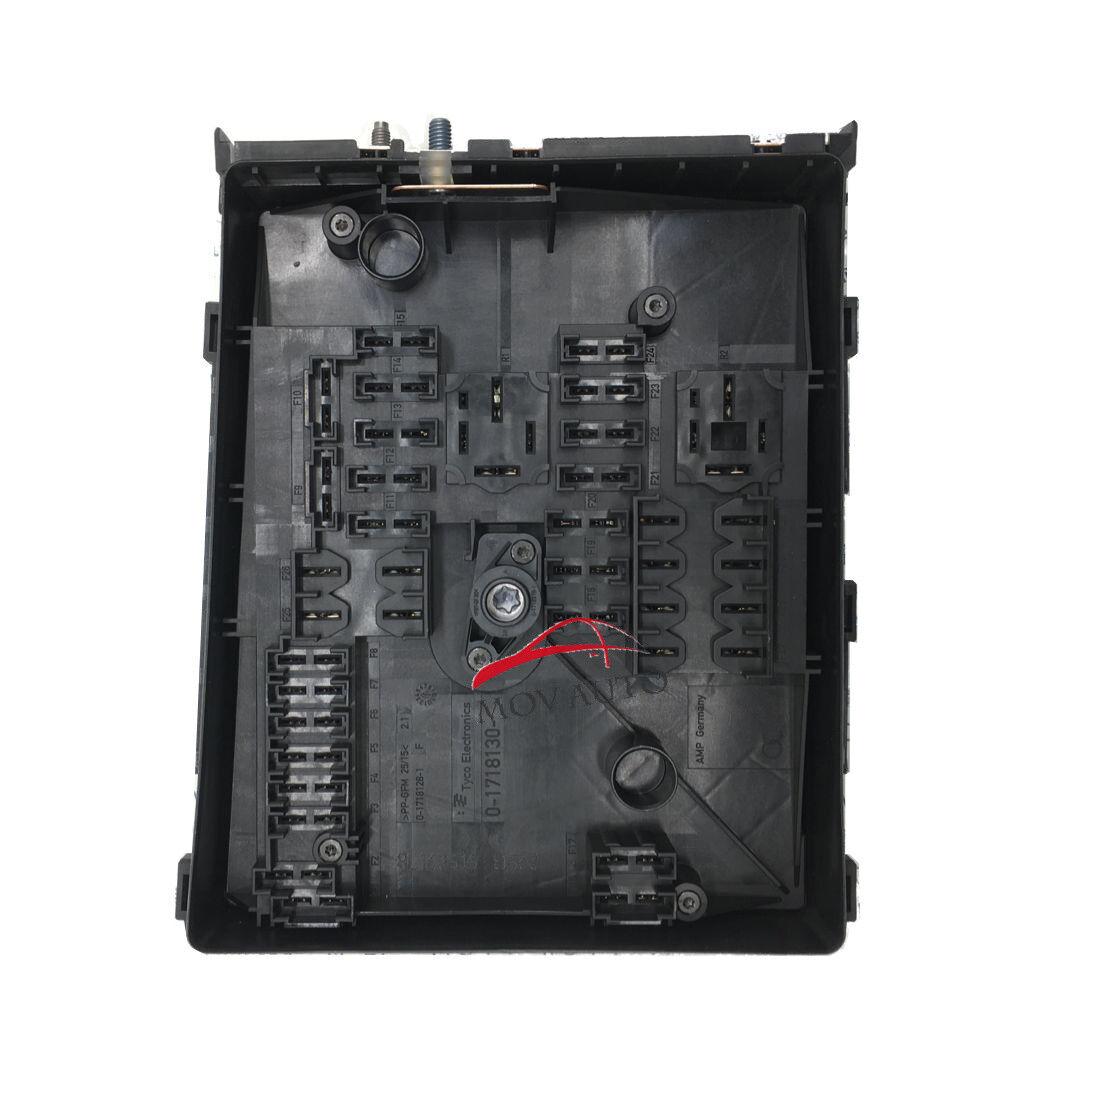 Oem Fuse Box Board Relay Set For Vw Golf Gti Jetta Mk5